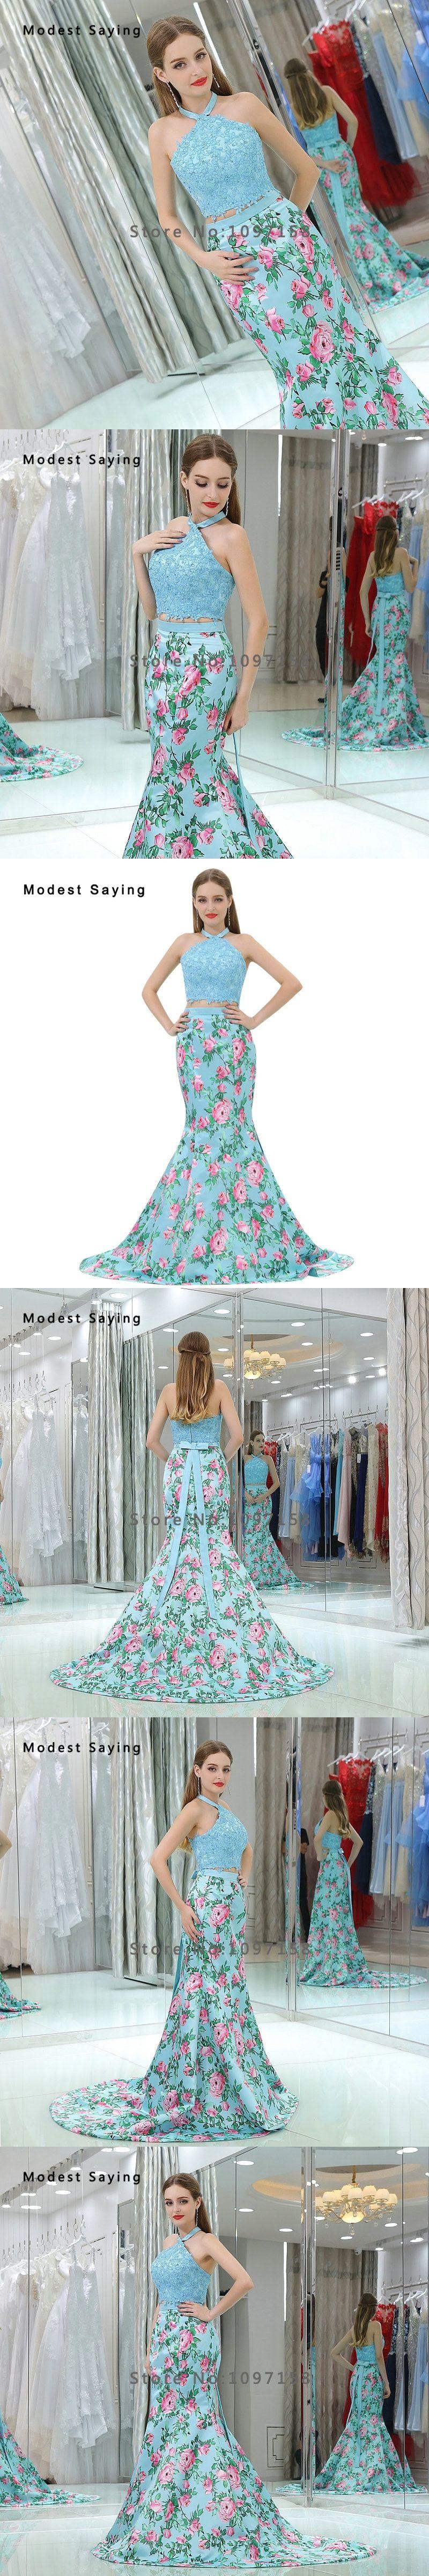 Elegant light blue mermaid floral printed piece beaded lace prom